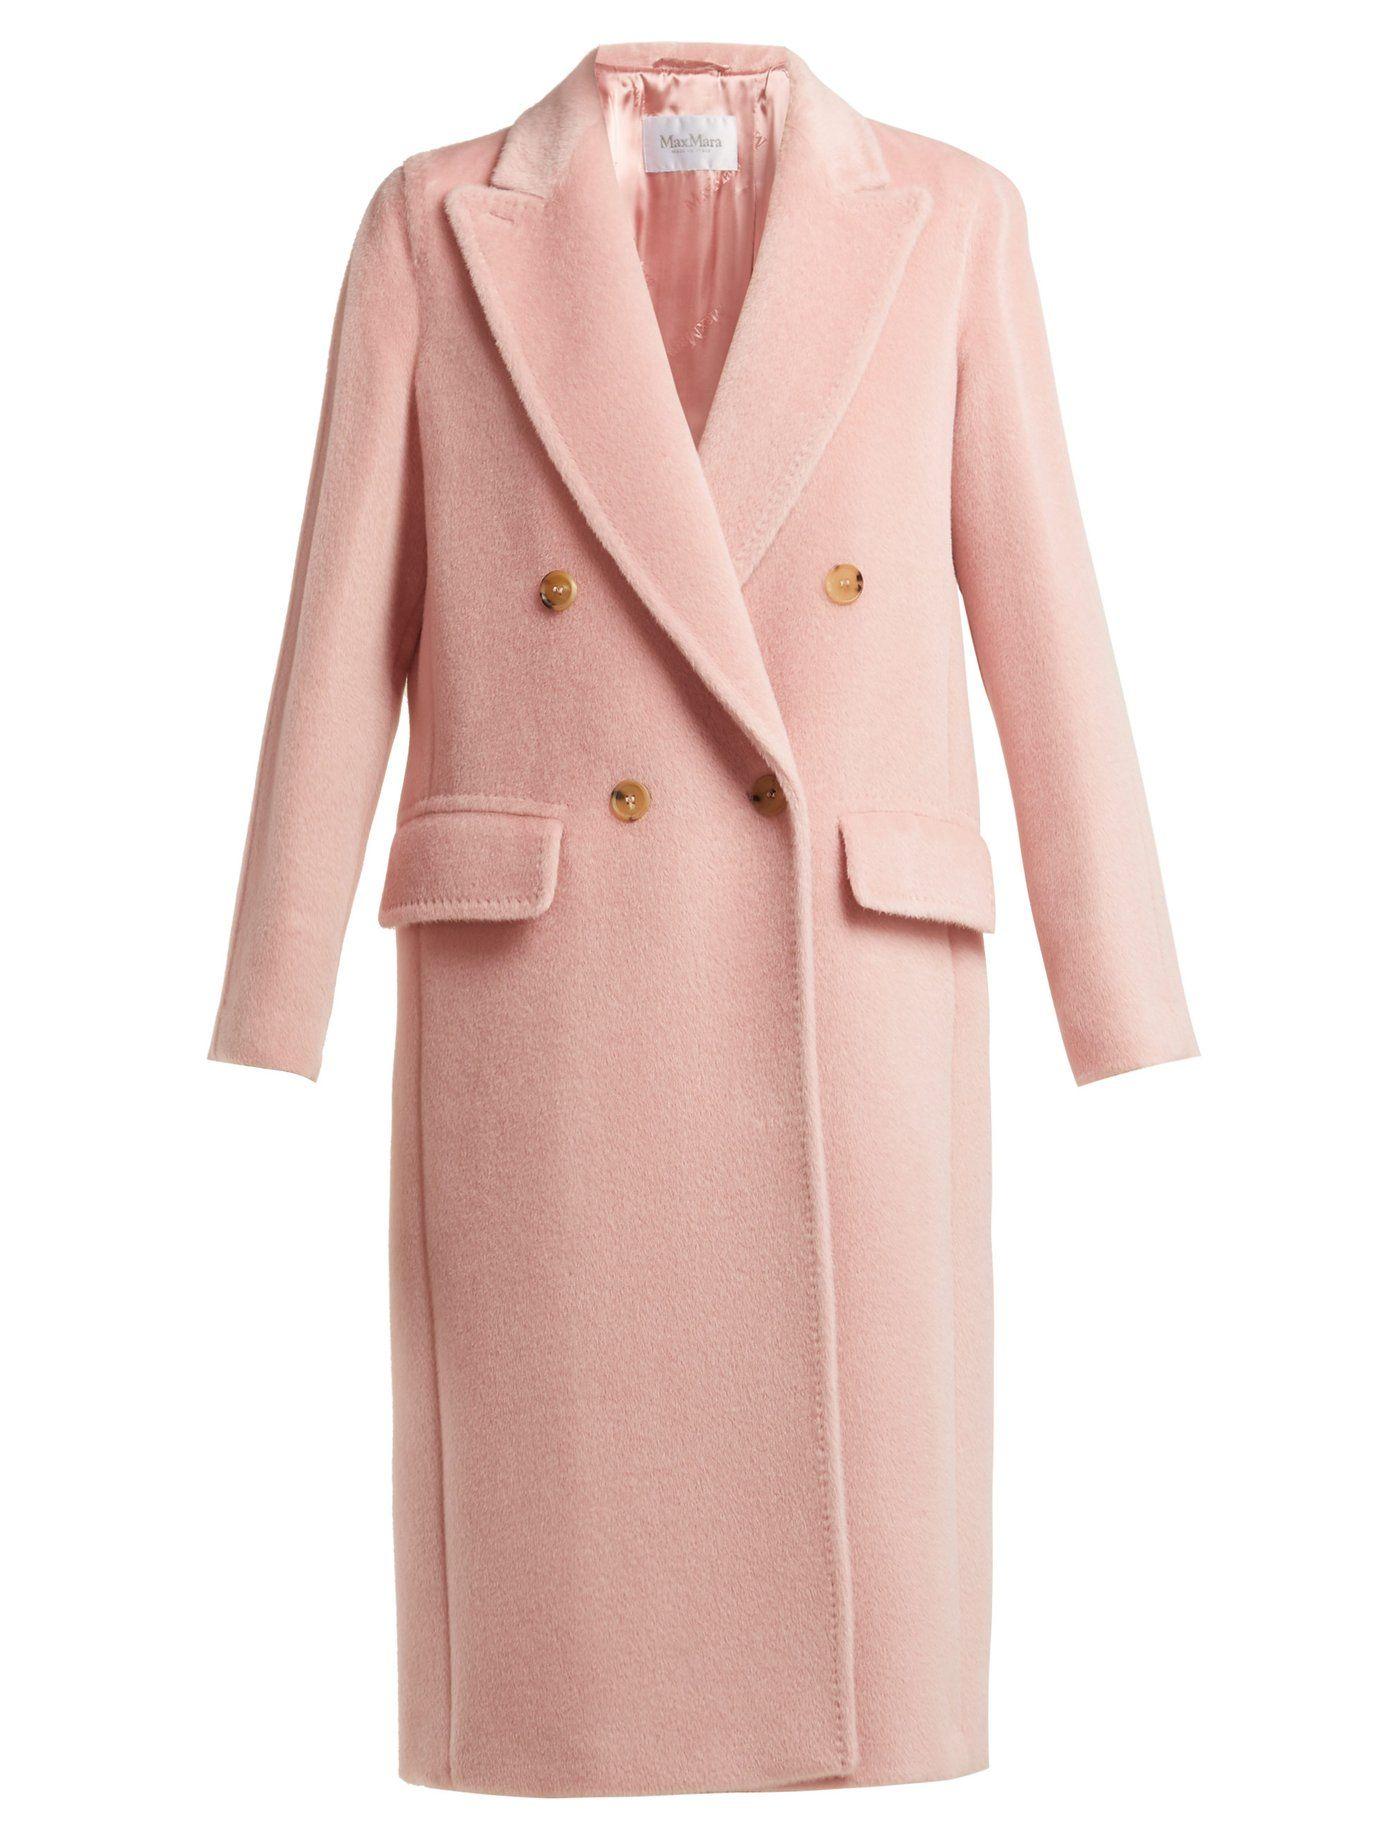 bf01bca2bb81 Zarda coat